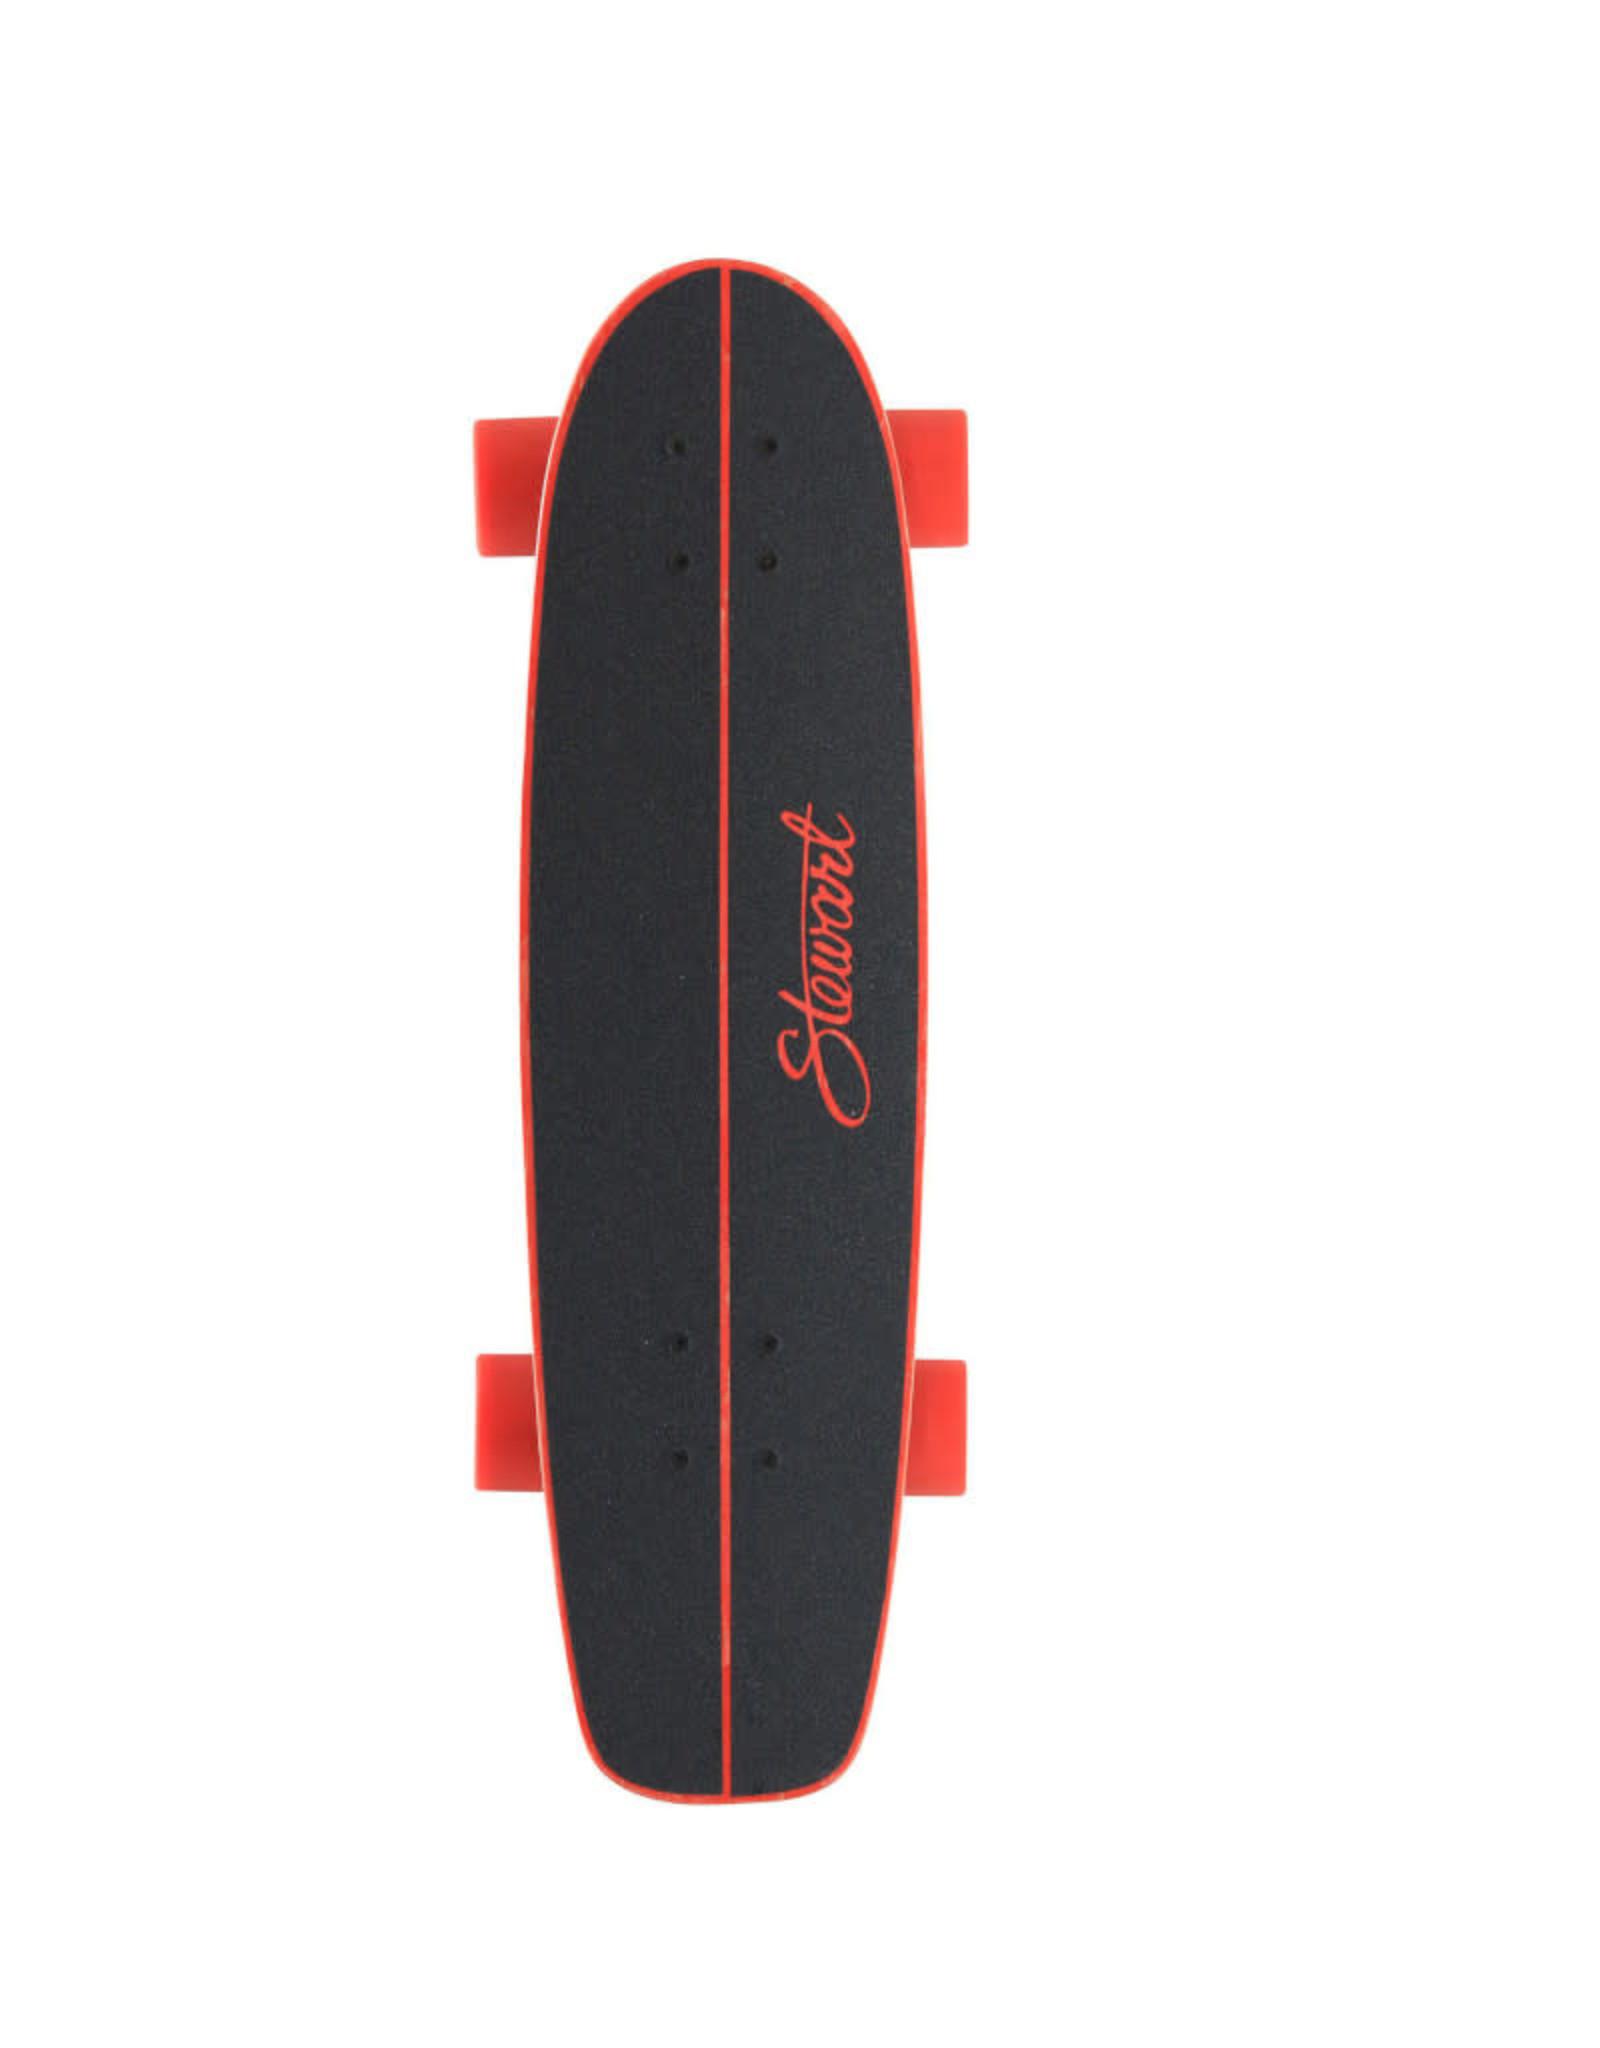 Flying Wheels Flying Wheels Skateboard Bill Stewart 28 navy Limited Edition Cruiser